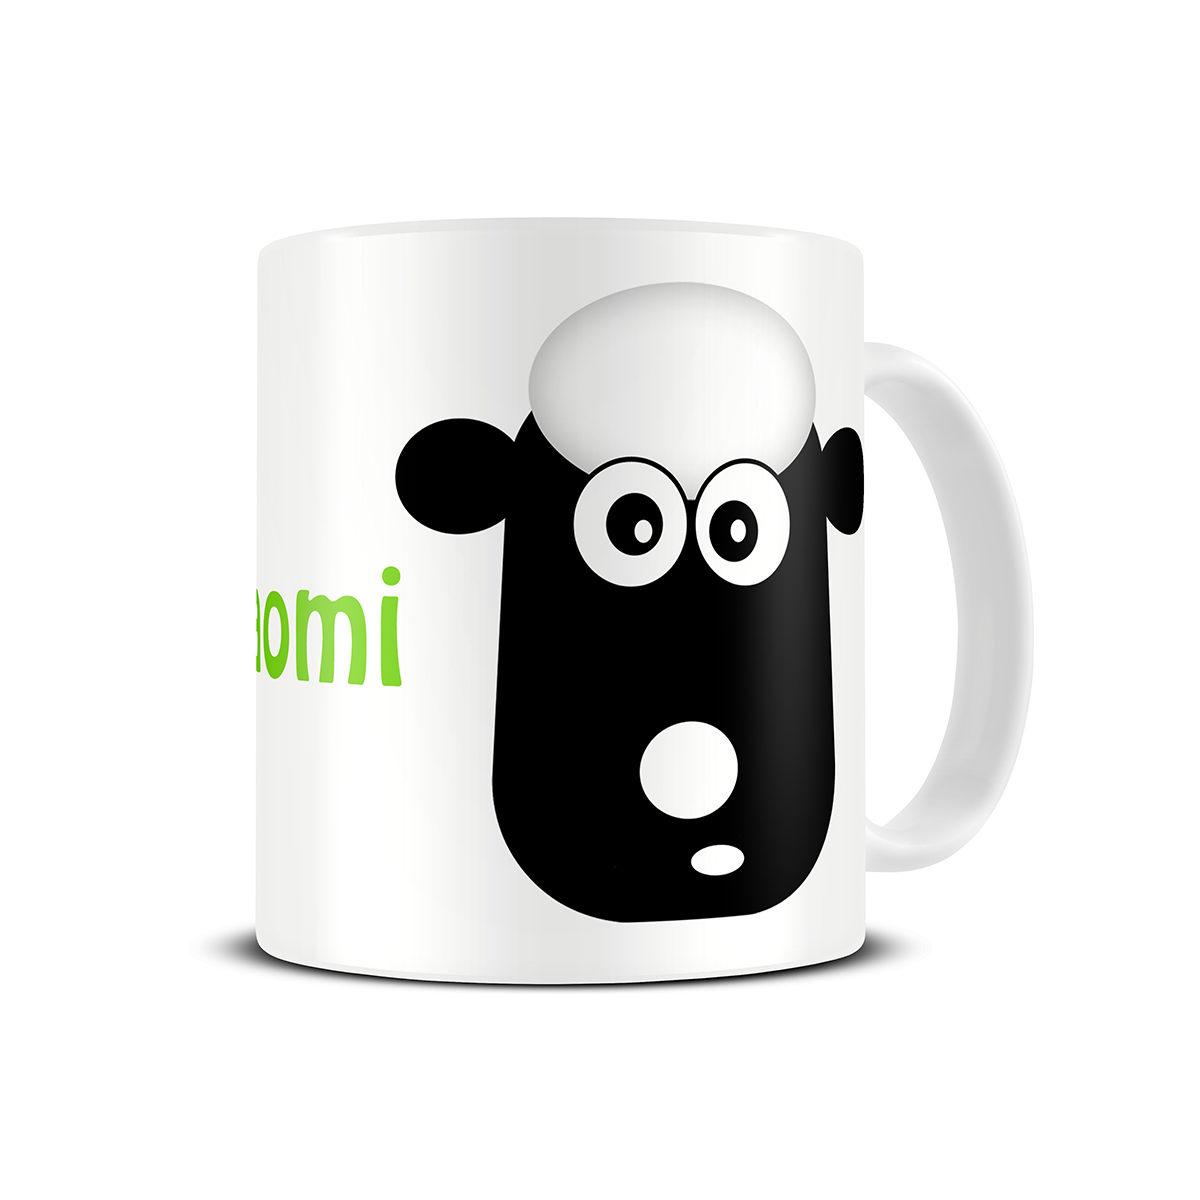 sheep mug